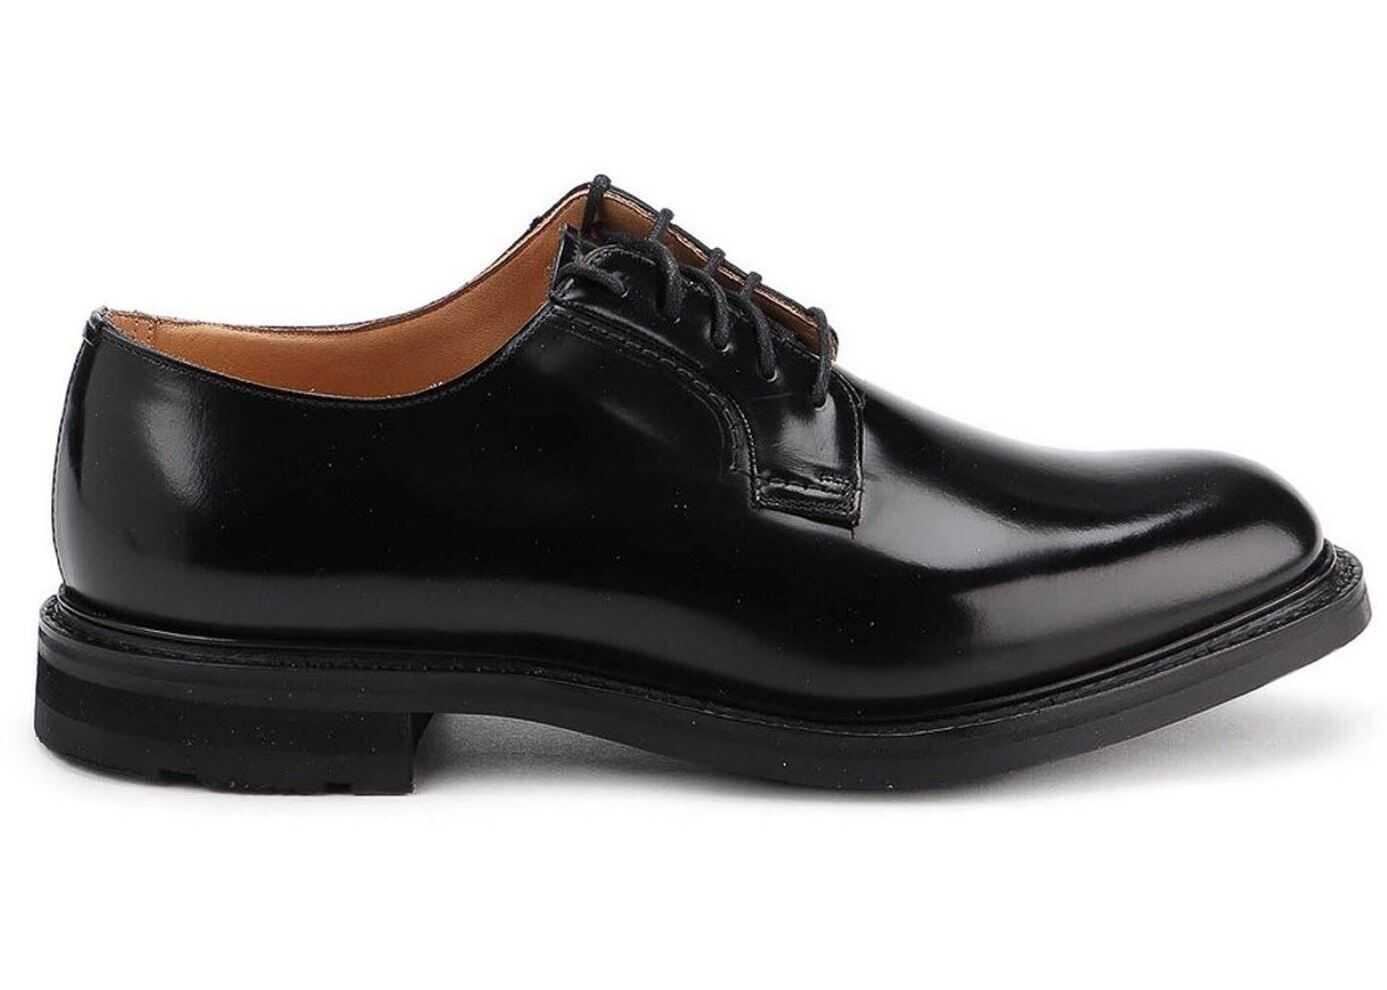 Church's Woodbridge Polished Leather Derby Shoes In Black EEC185 9XV F0CY2 Black imagine b-mall.ro